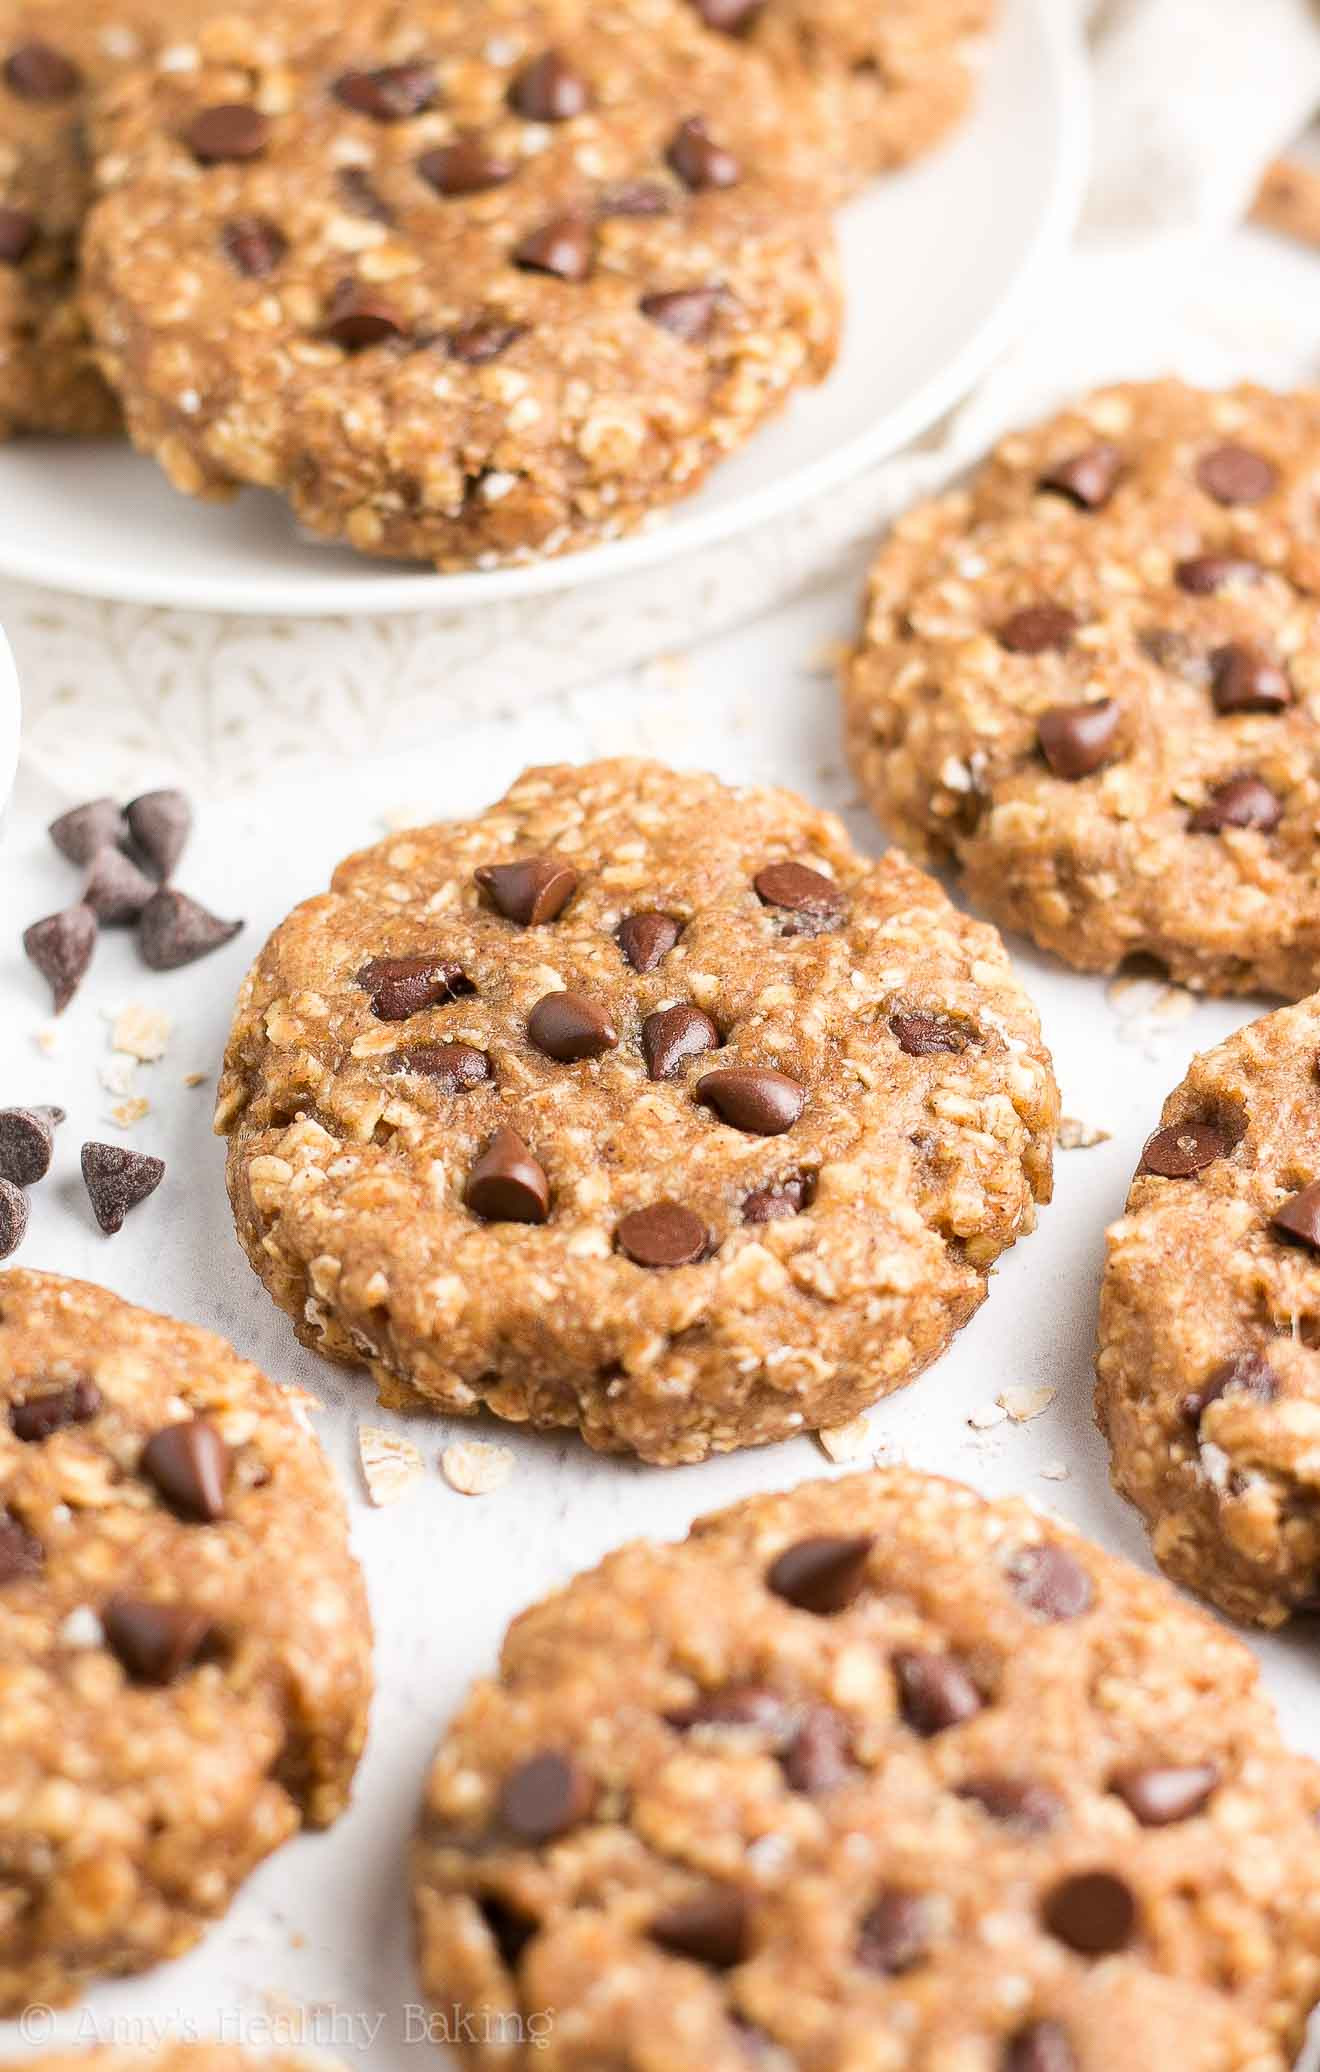 Healthy Peanut Butter Oatmeal Chocolate Chip Cookies  Healthy Chocolate Chip Peanut Butter Oatmeal Breakfast